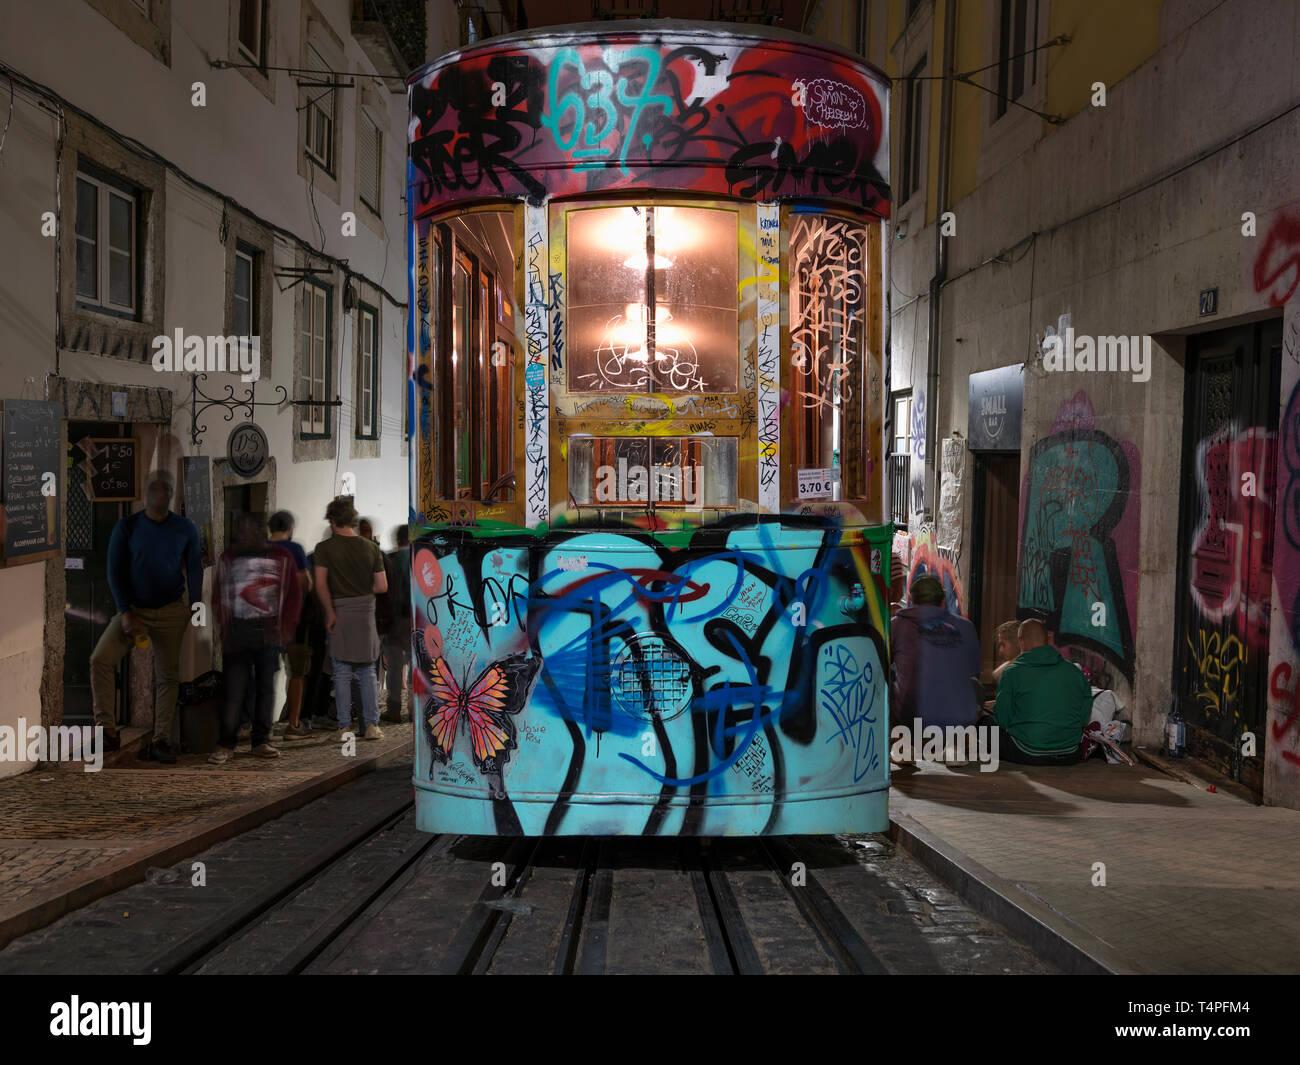 A graffitied cable car (Elevador da Bica) on Rua de Bica de Duarte Belo, Barrio Alto district. Veiw from Lagro Calhariz. Stock Photo